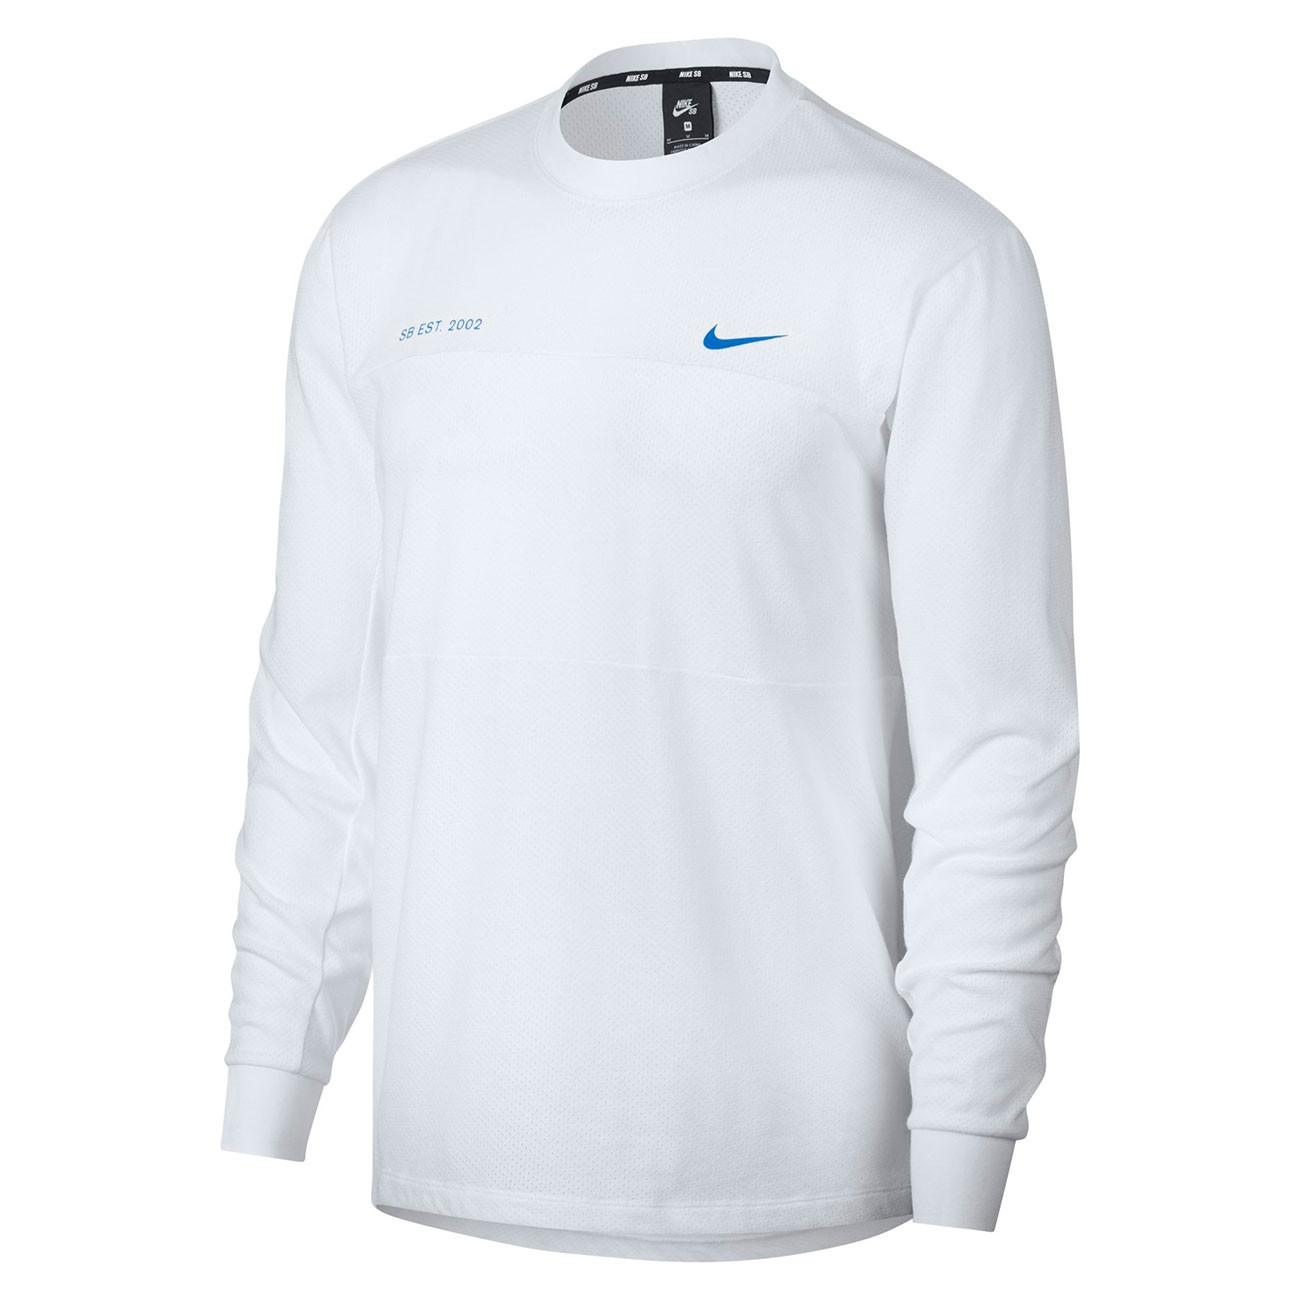 d4ccc676784b Tričko Nike SB Mesh Ls white photo blue